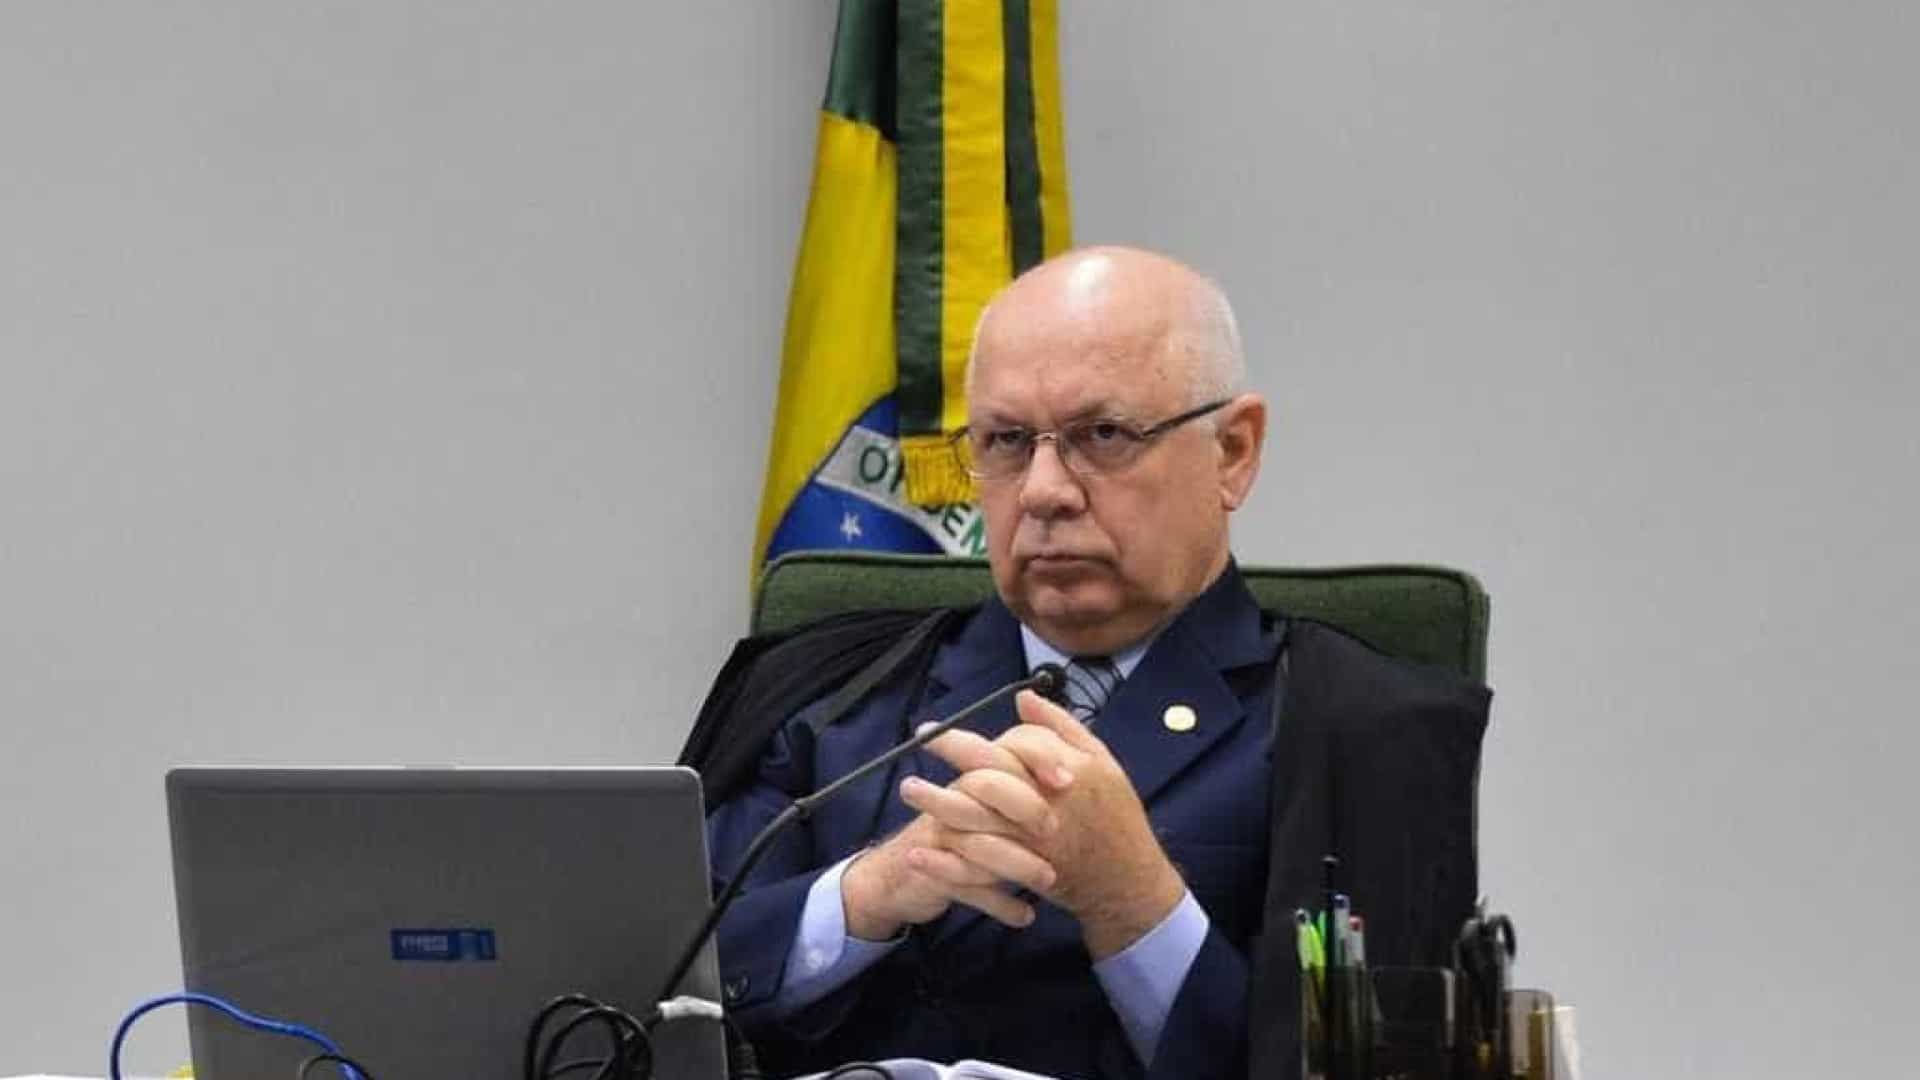 STF vai averiguar se Dilma tentou obstruir a Justiça